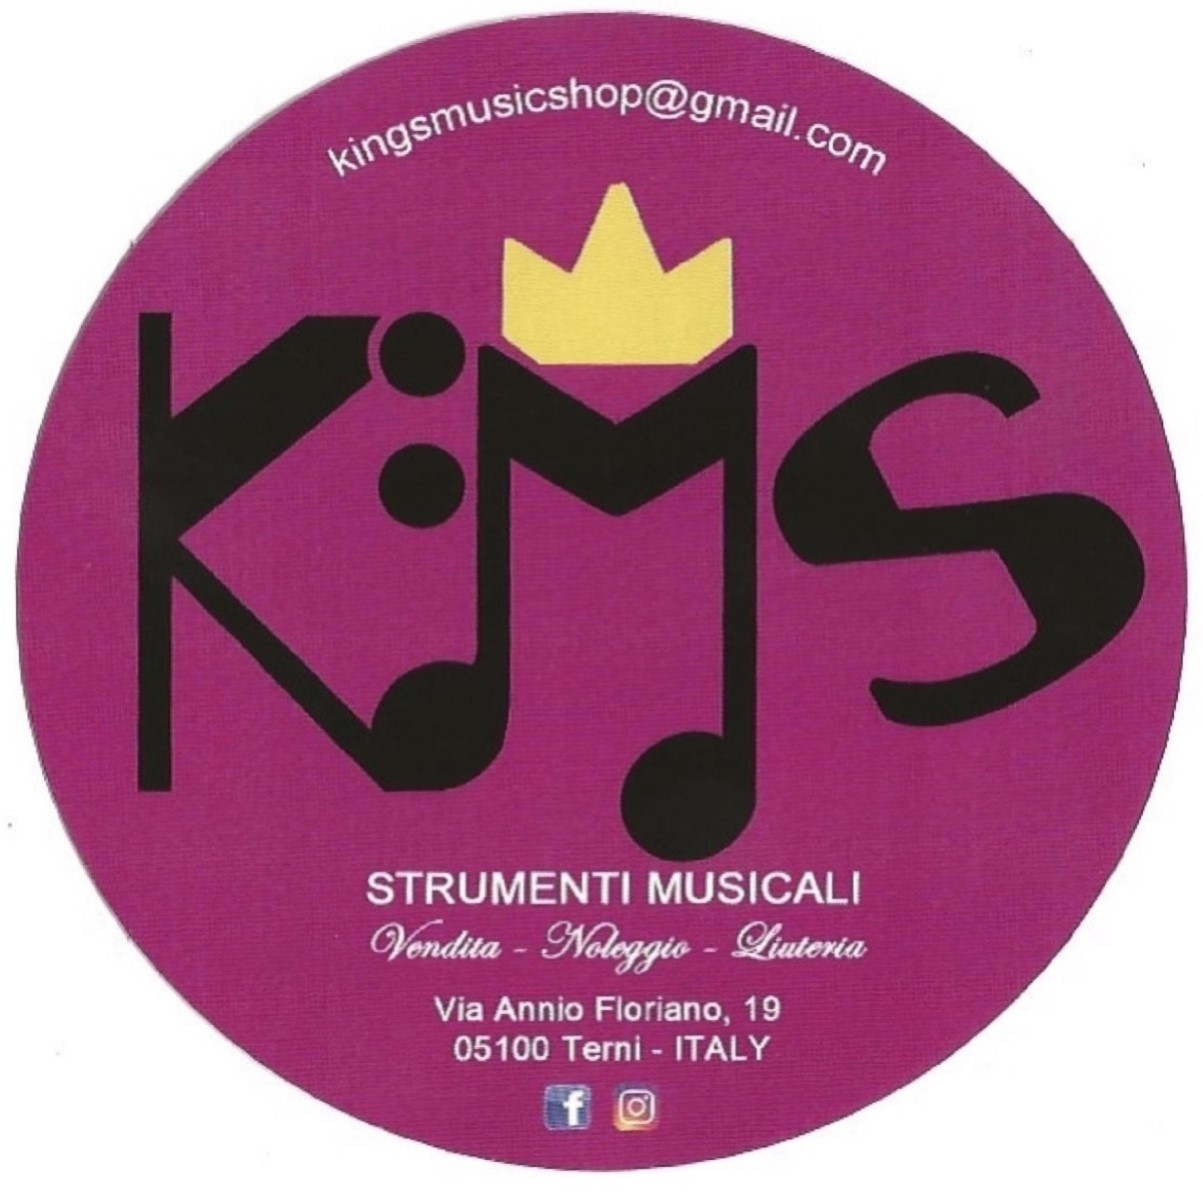 KINGS MUSIC SHOP - VENDITA CHITARRE BASSI AMPLIFICATORI - 1